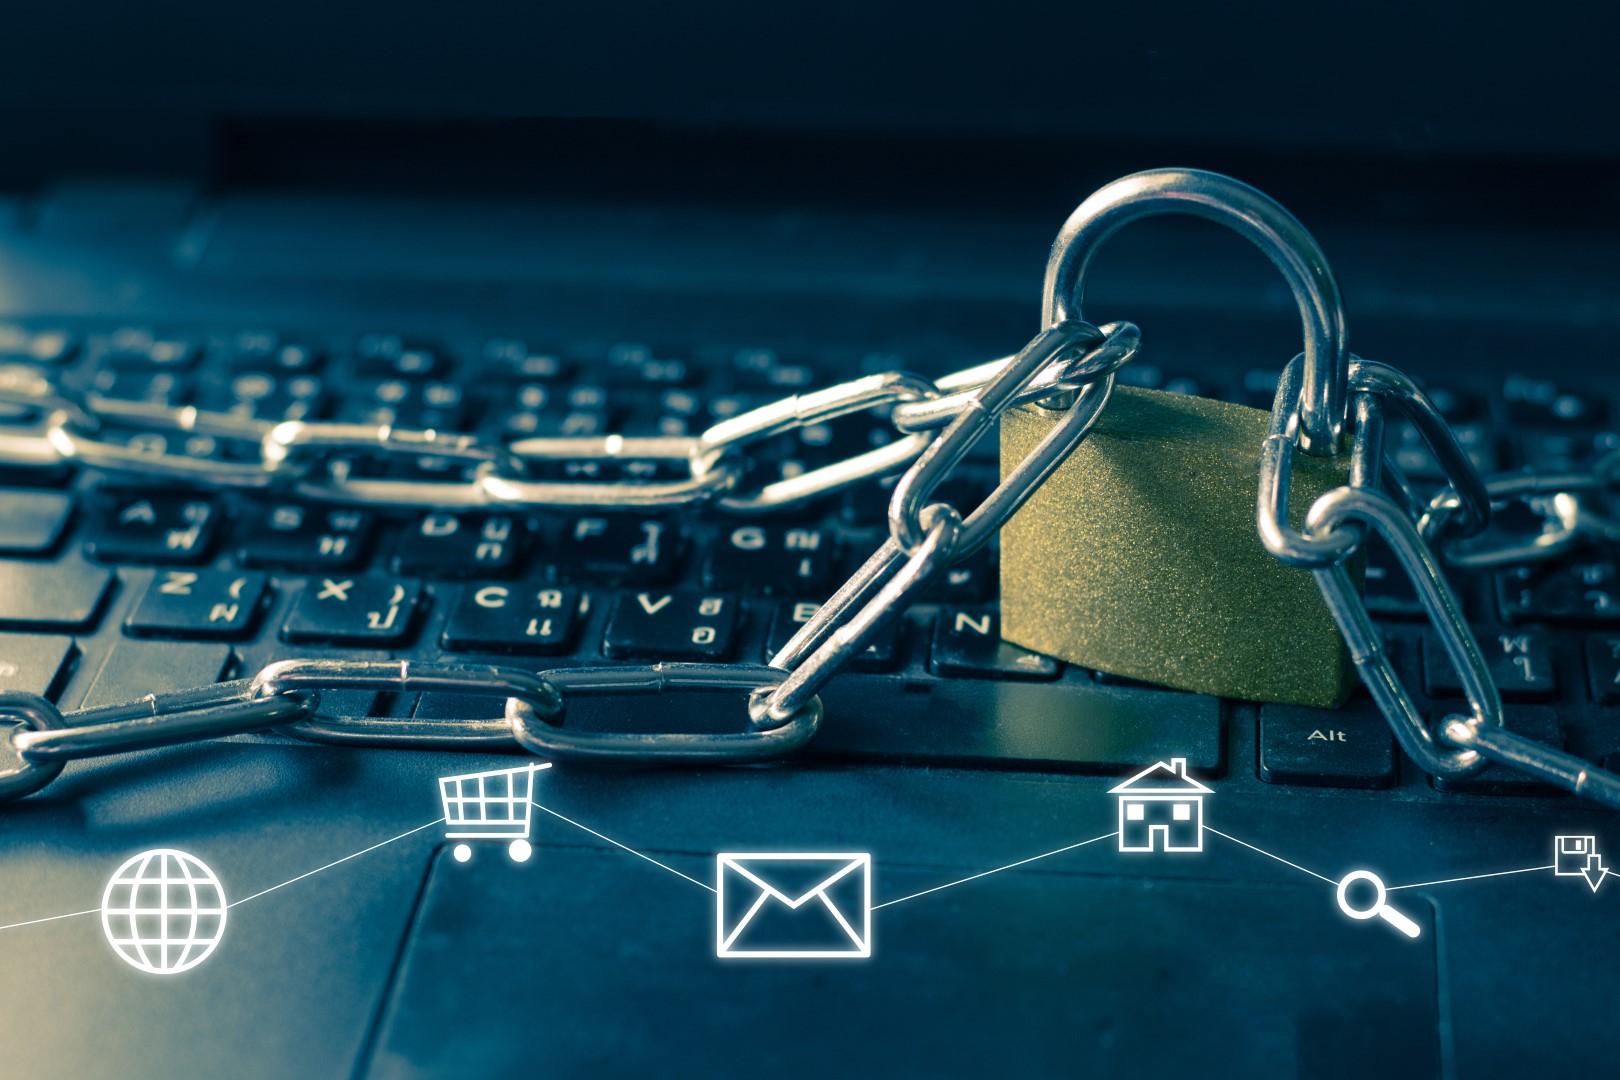 Google Preps New Service after Global Email Encryption Warning